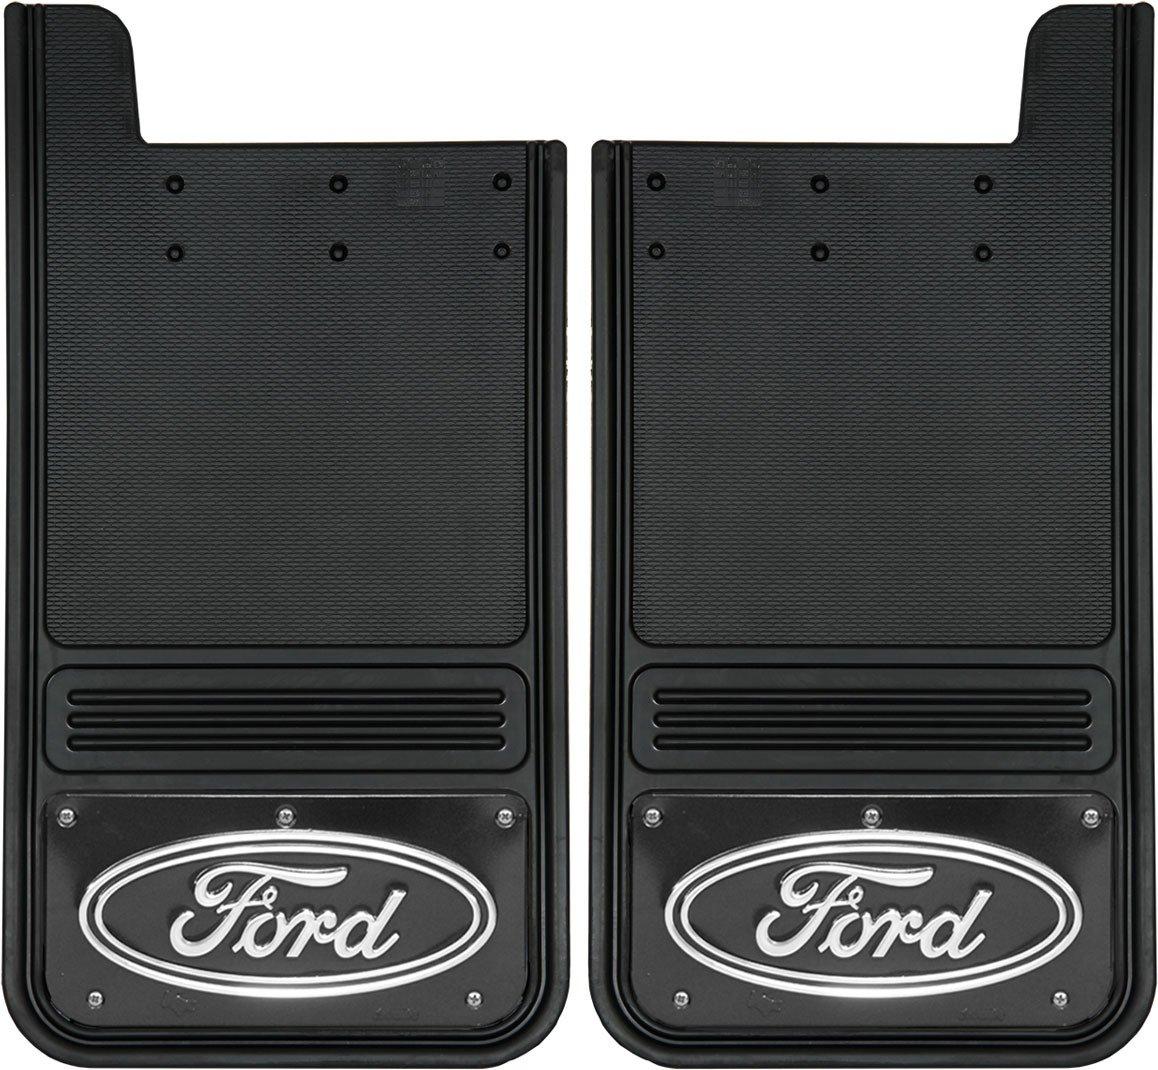 Gatorback Ford Oval Truck Mud Flaps - Rear Pair - Black Wrap Truck Hardware